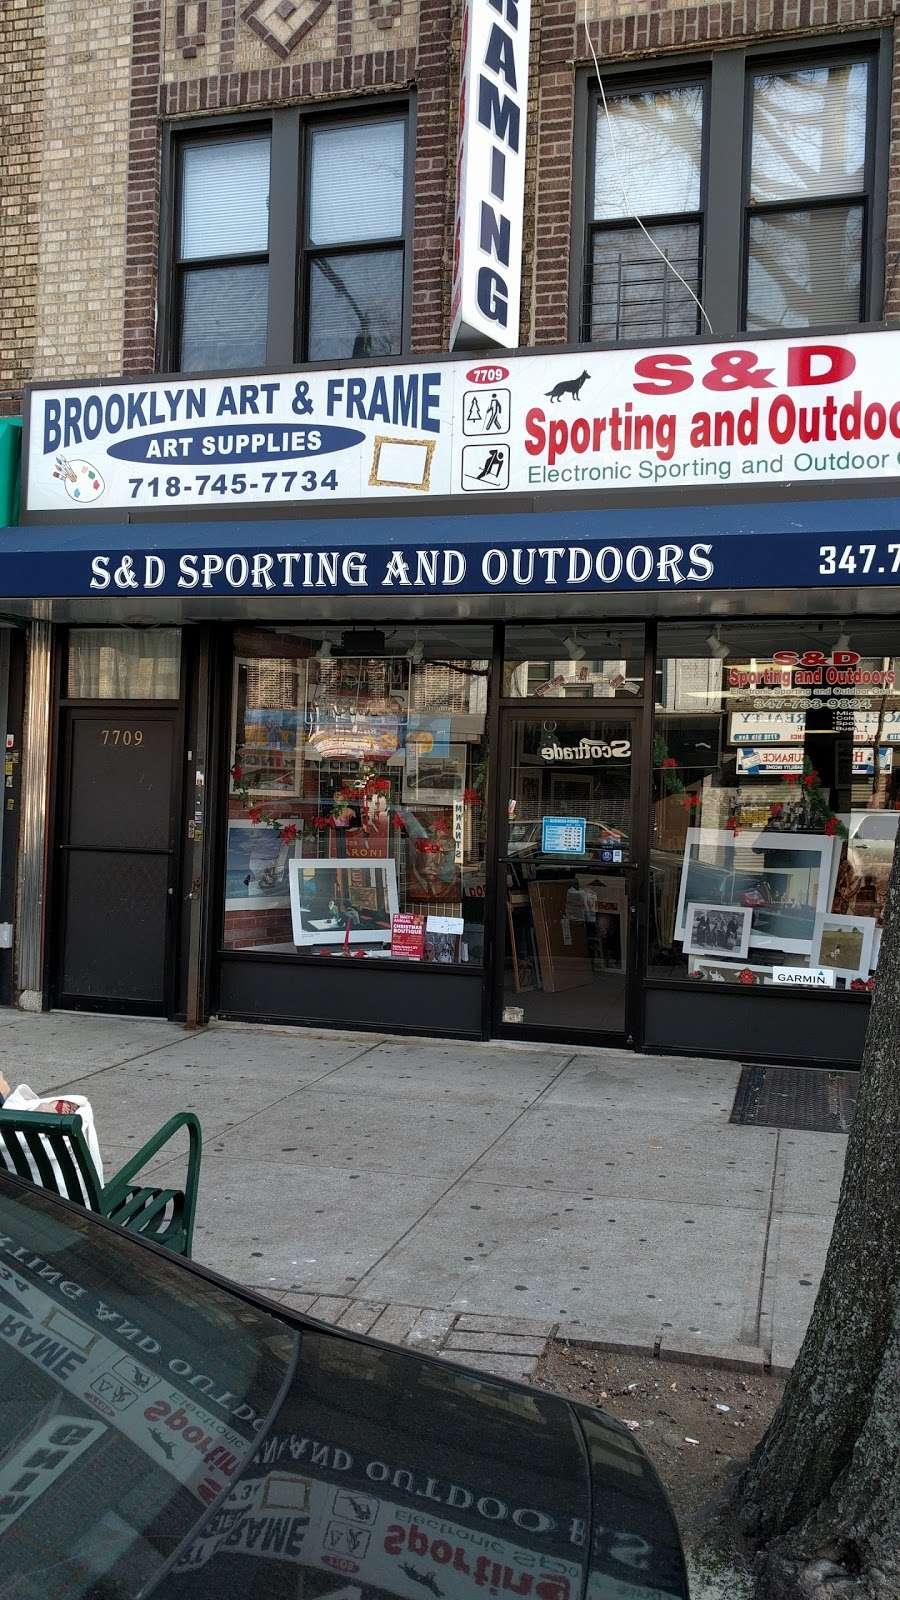 Brooklyn Art Corporation - art gallery  | Photo 2 of 2 | Address: 7709 5th Ave, Brooklyn, NY 11209, USA | Phone: (718) 745-7734